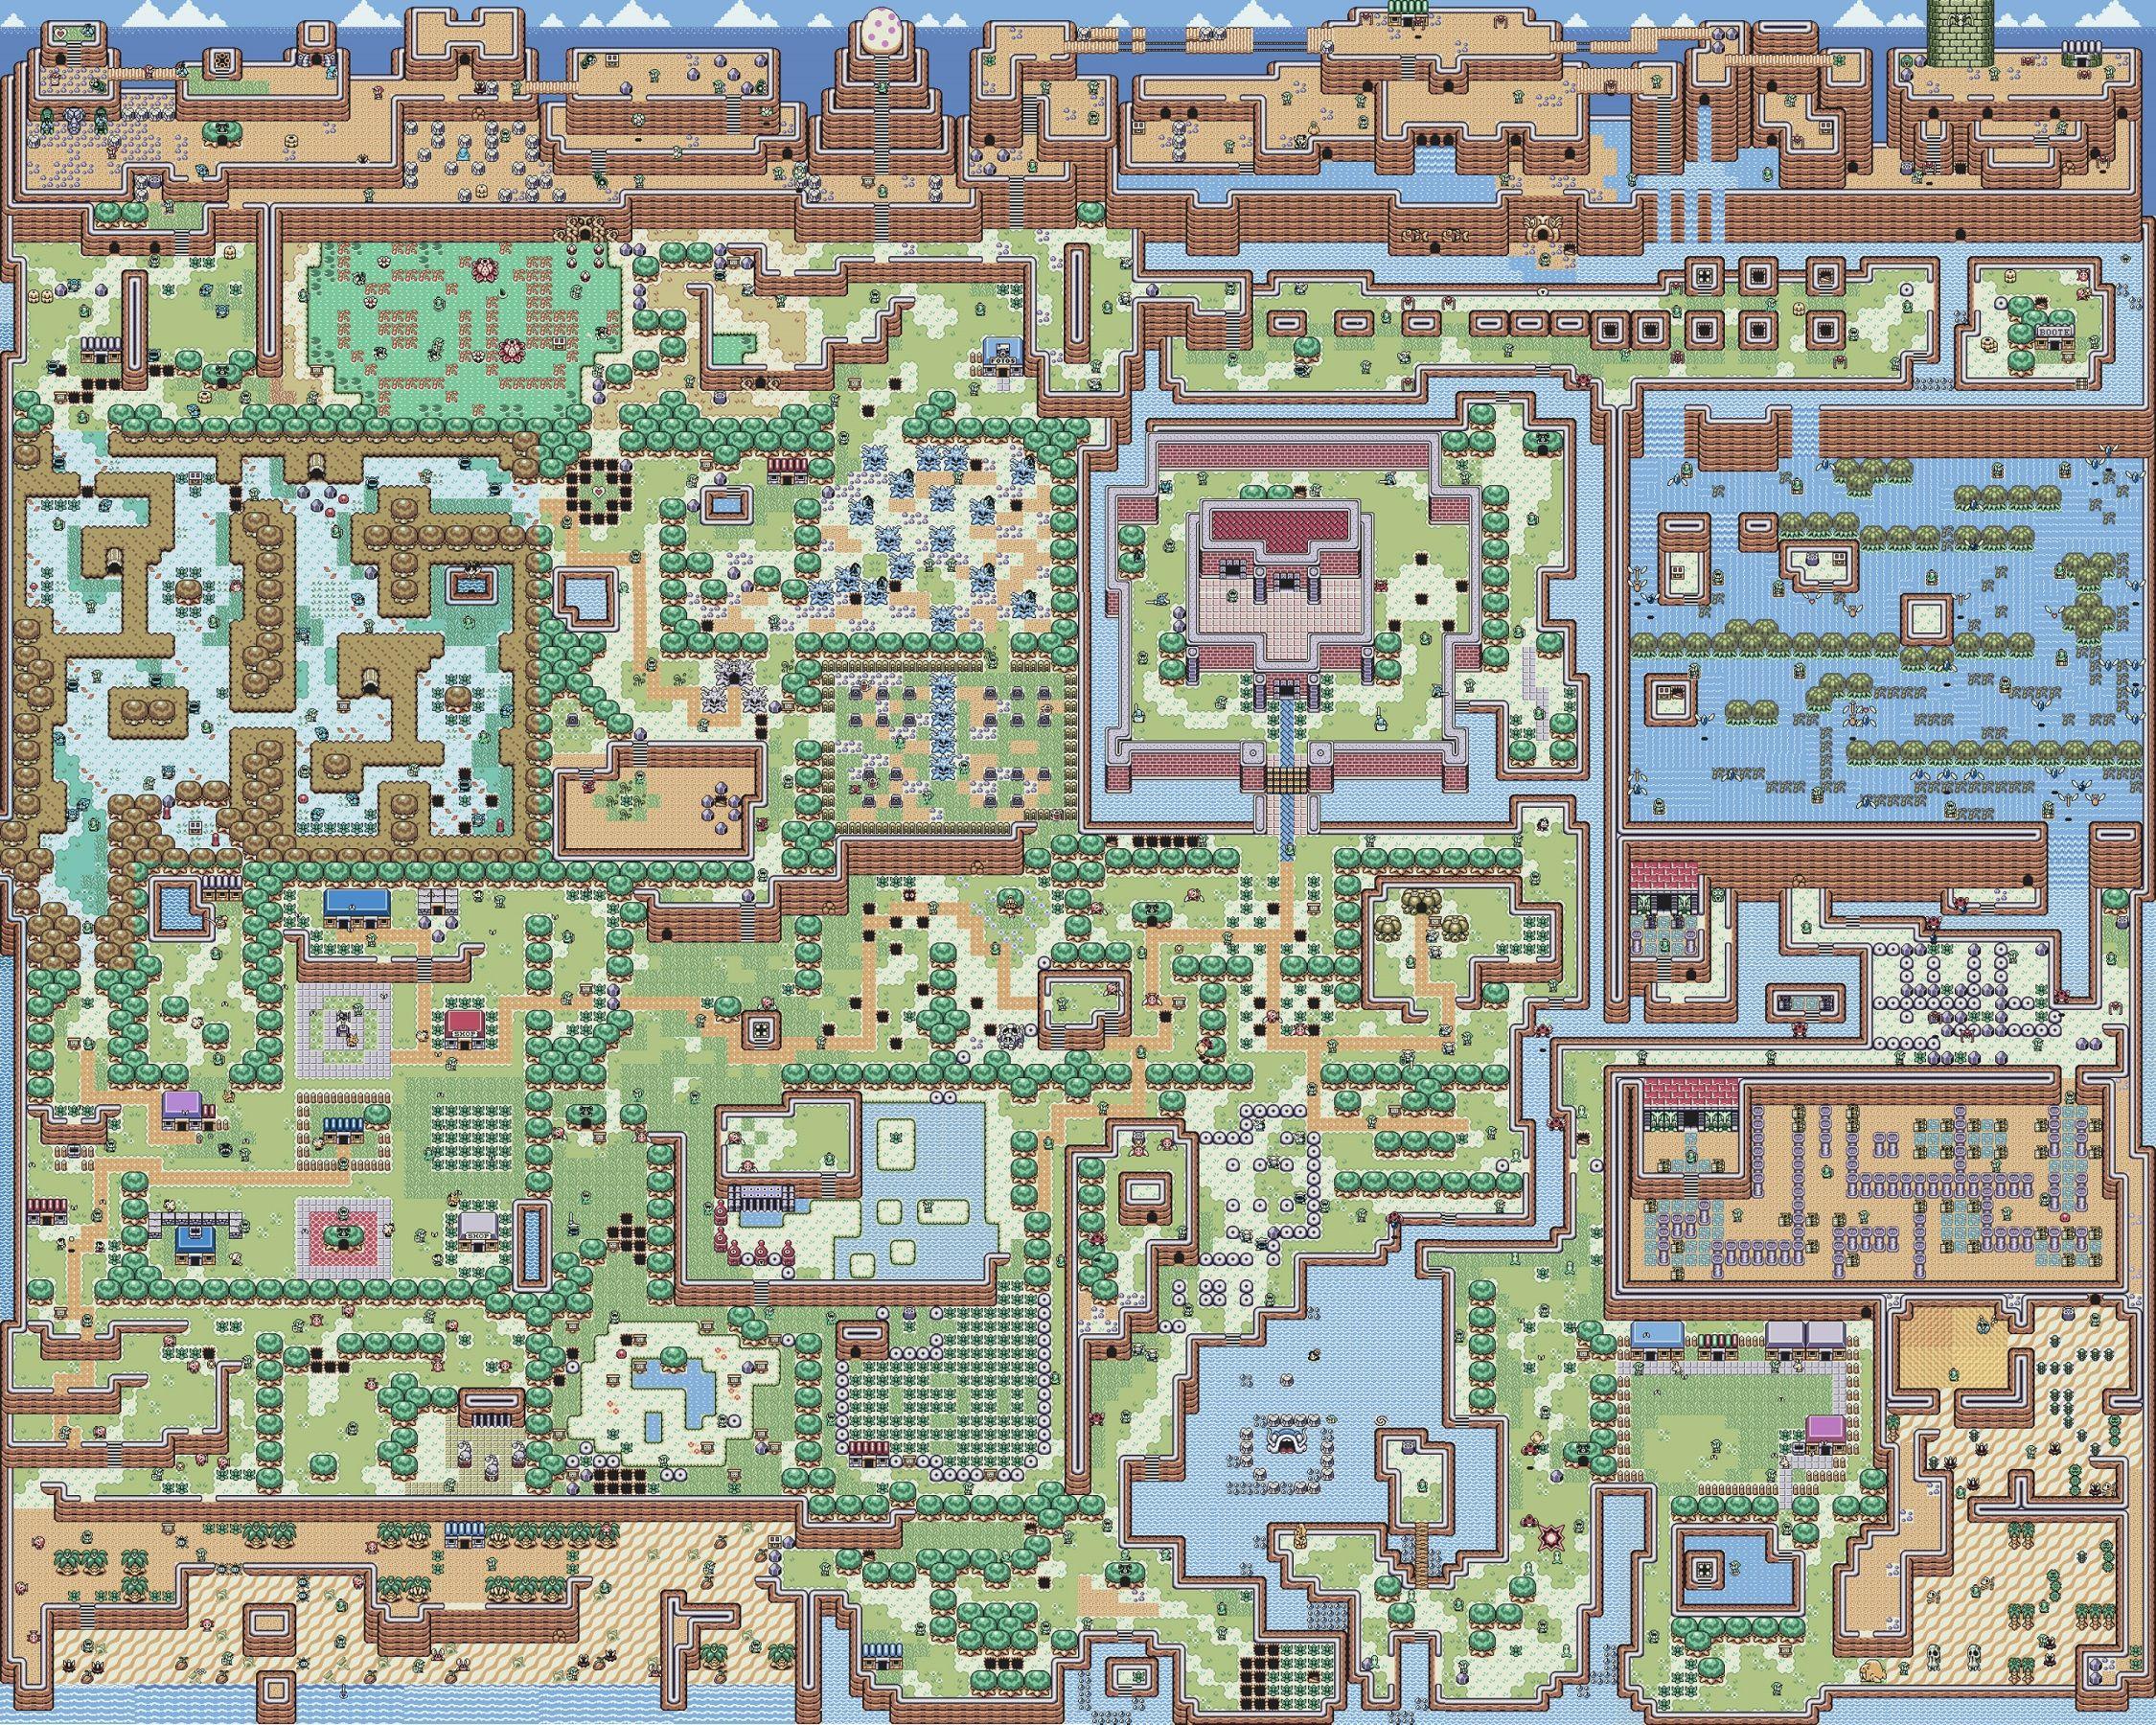 Another overworld map from a great Zelda game! | Pixel Art | Zelda